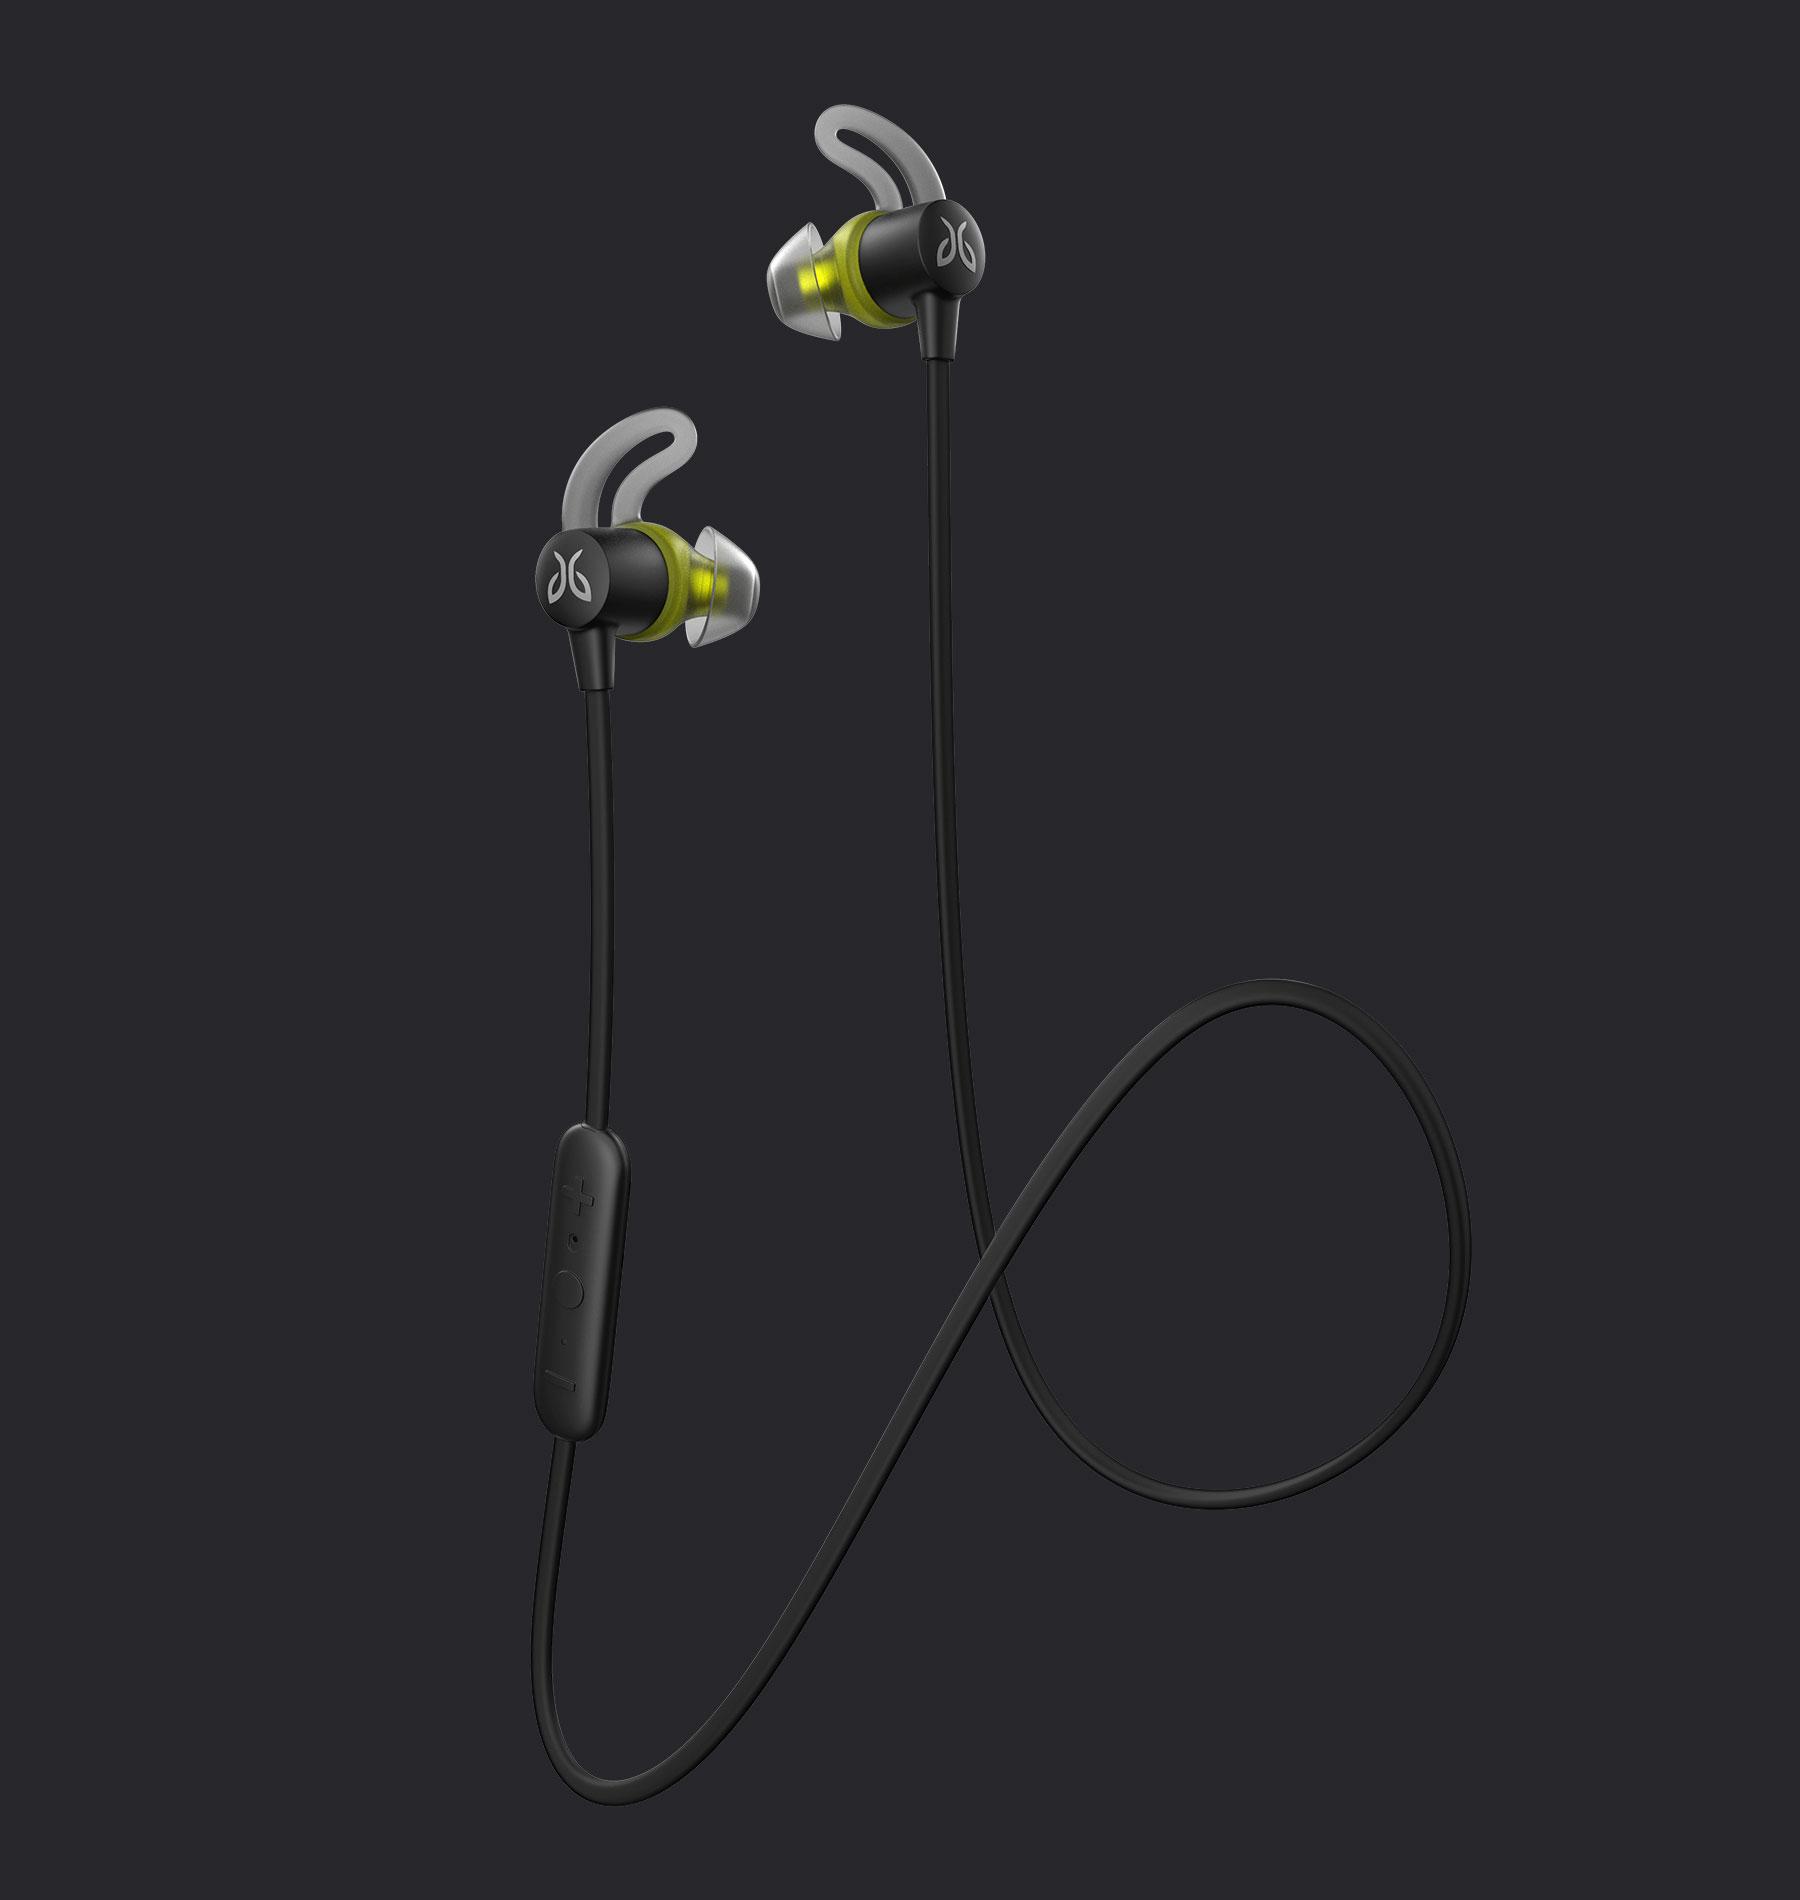 Aliexpress.com : Buy TWS Bluetooth 5.0 Wireless Earphones